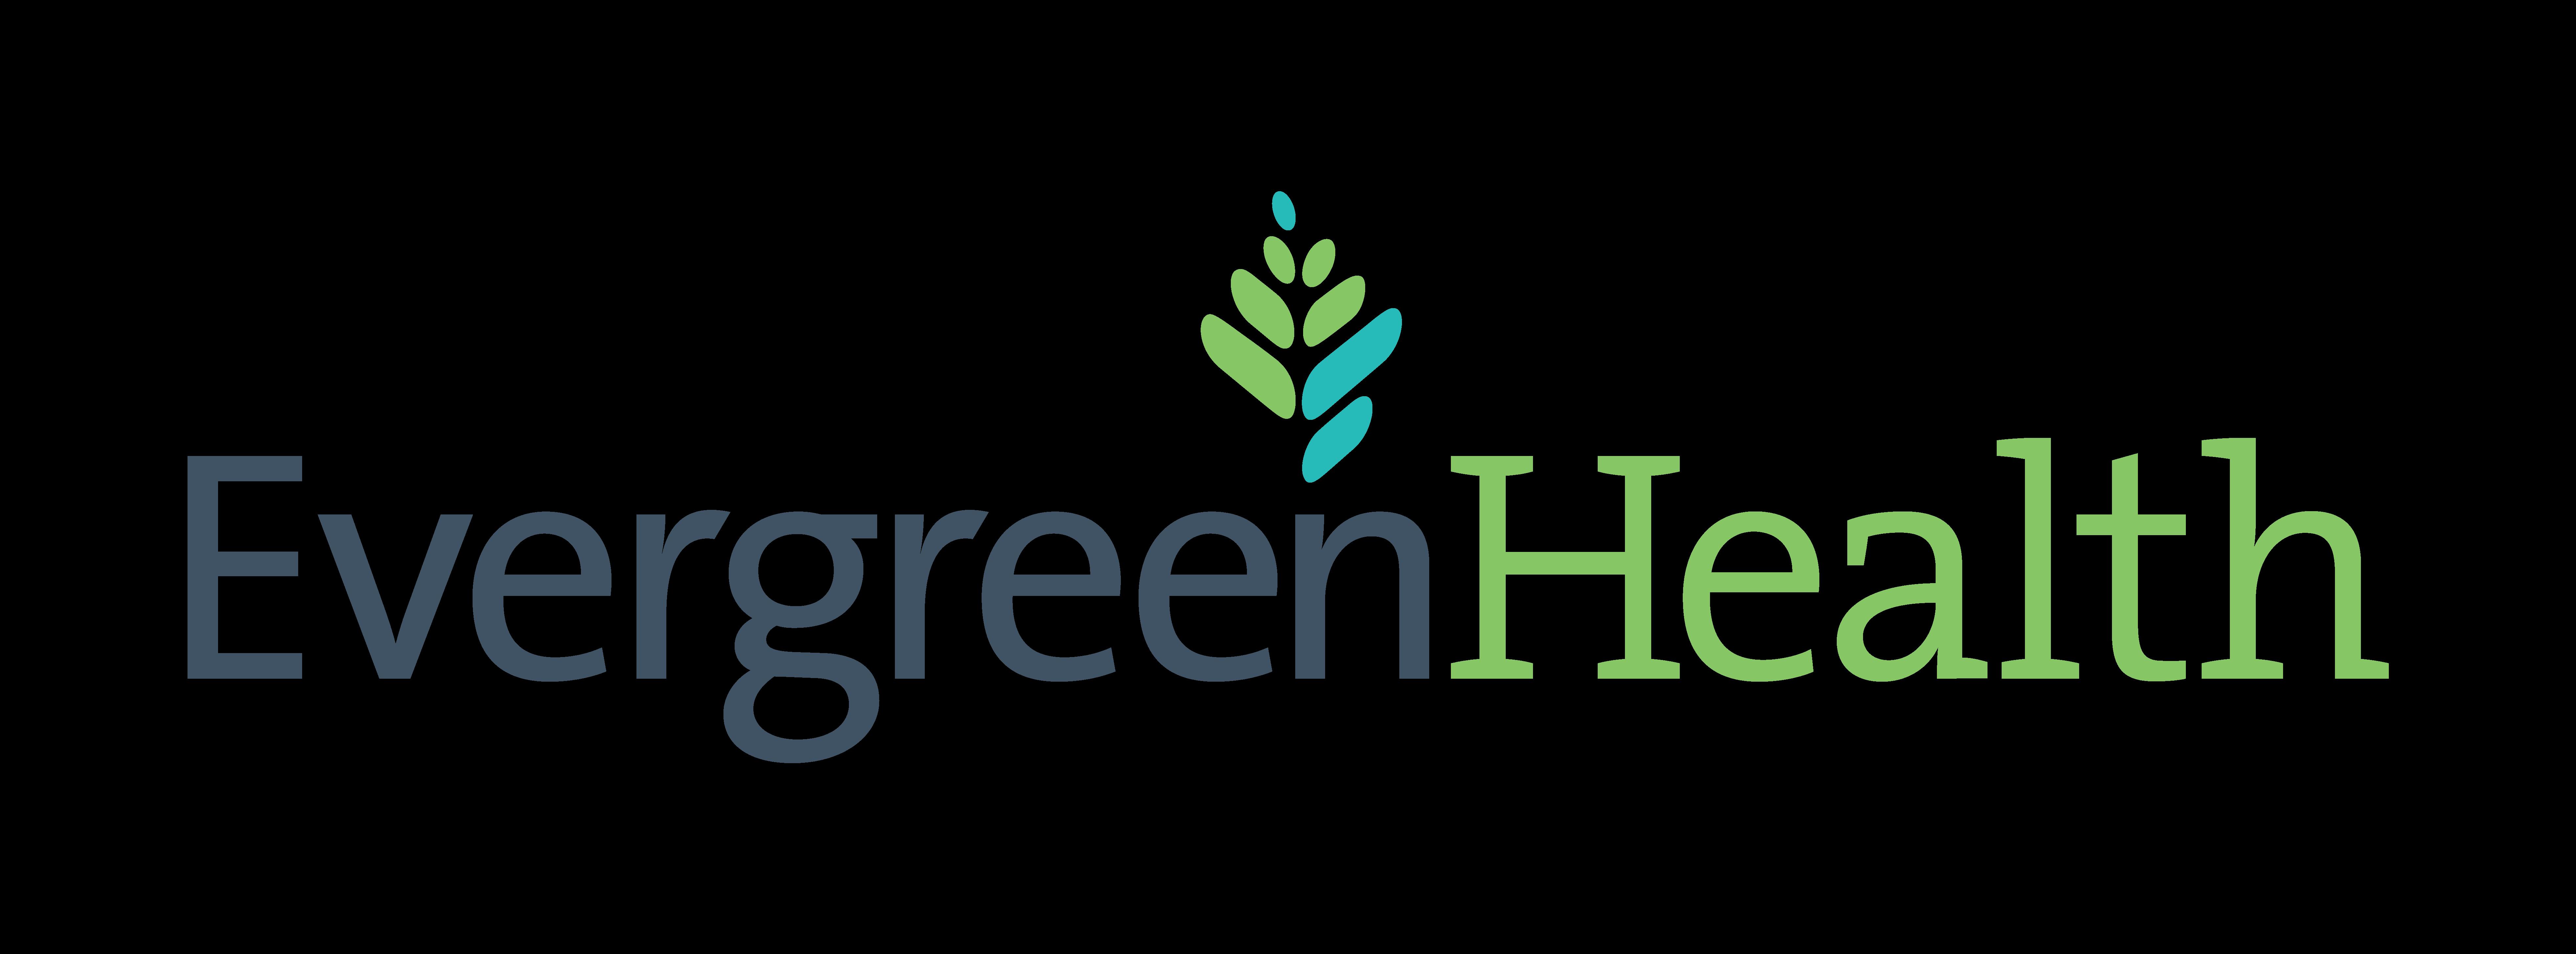 Evergreen Health